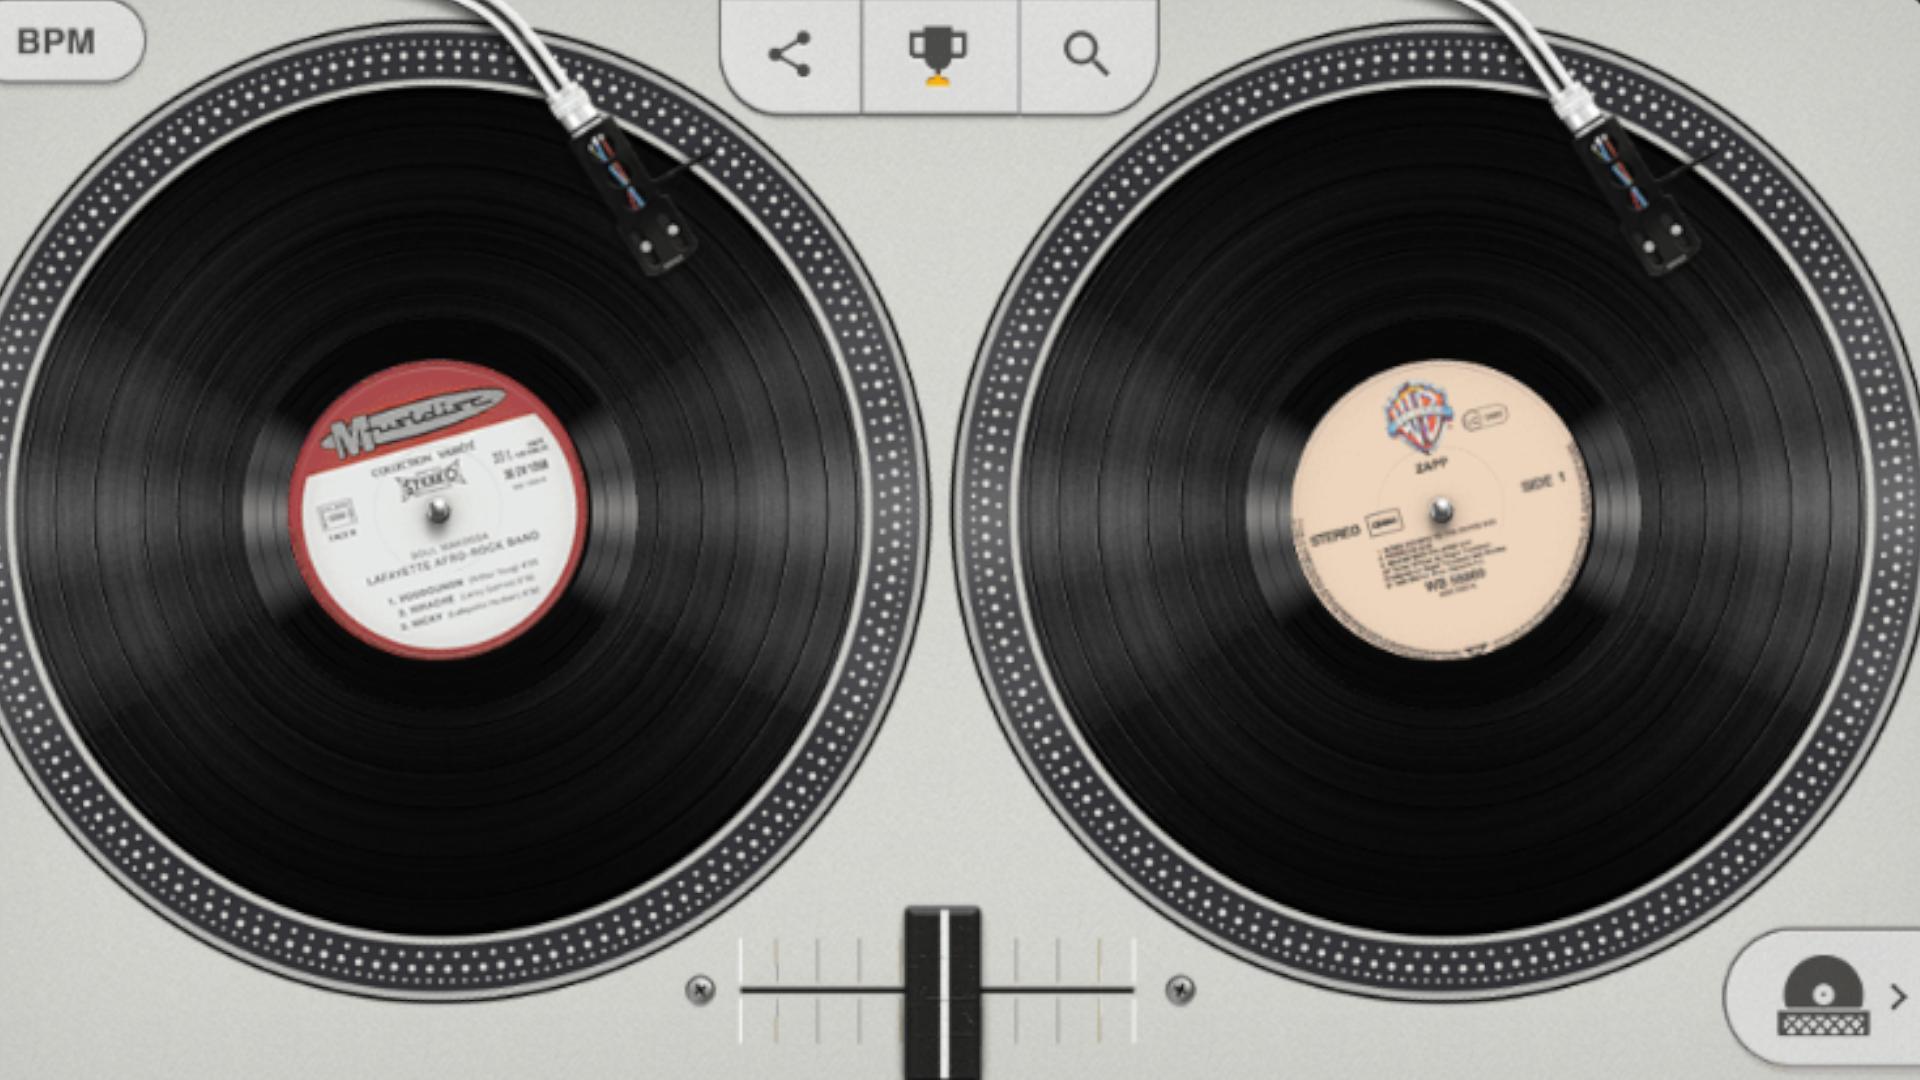 Brinque de DJ e faça mixagens de Hip Hop (Fonte: Google Doodle)